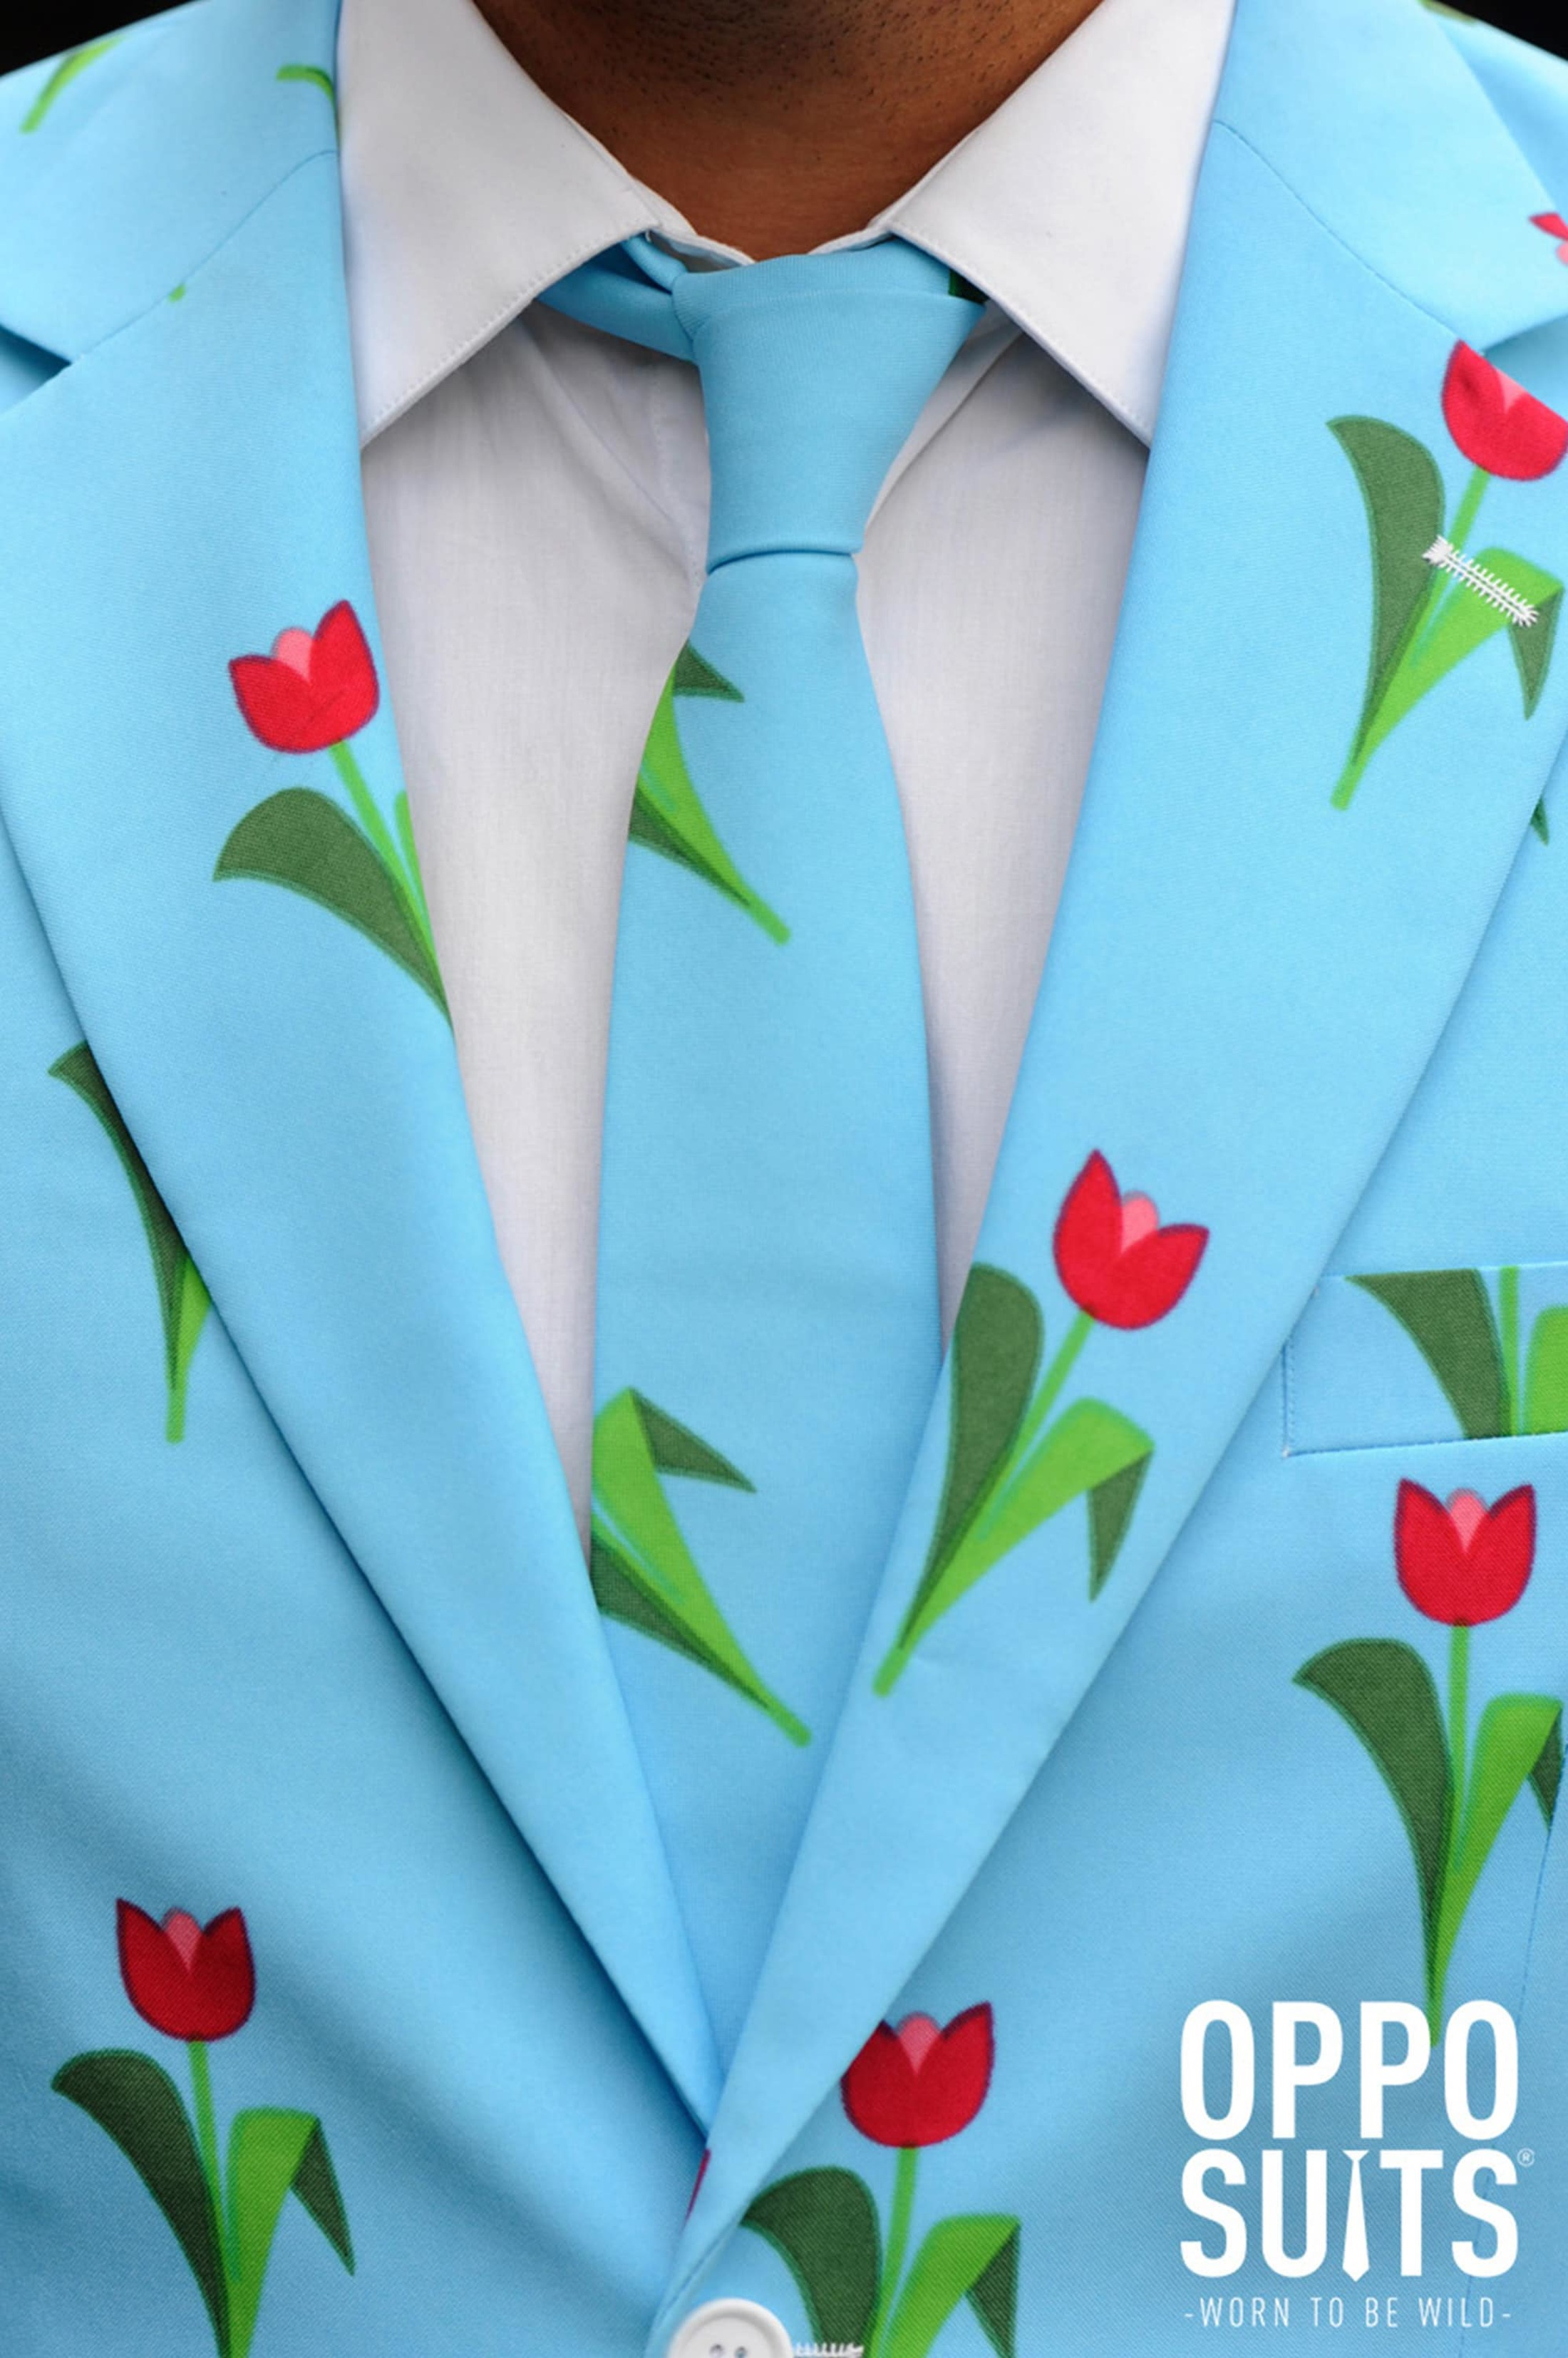 OppoSuits Tulips from Amsterdam Kostüm